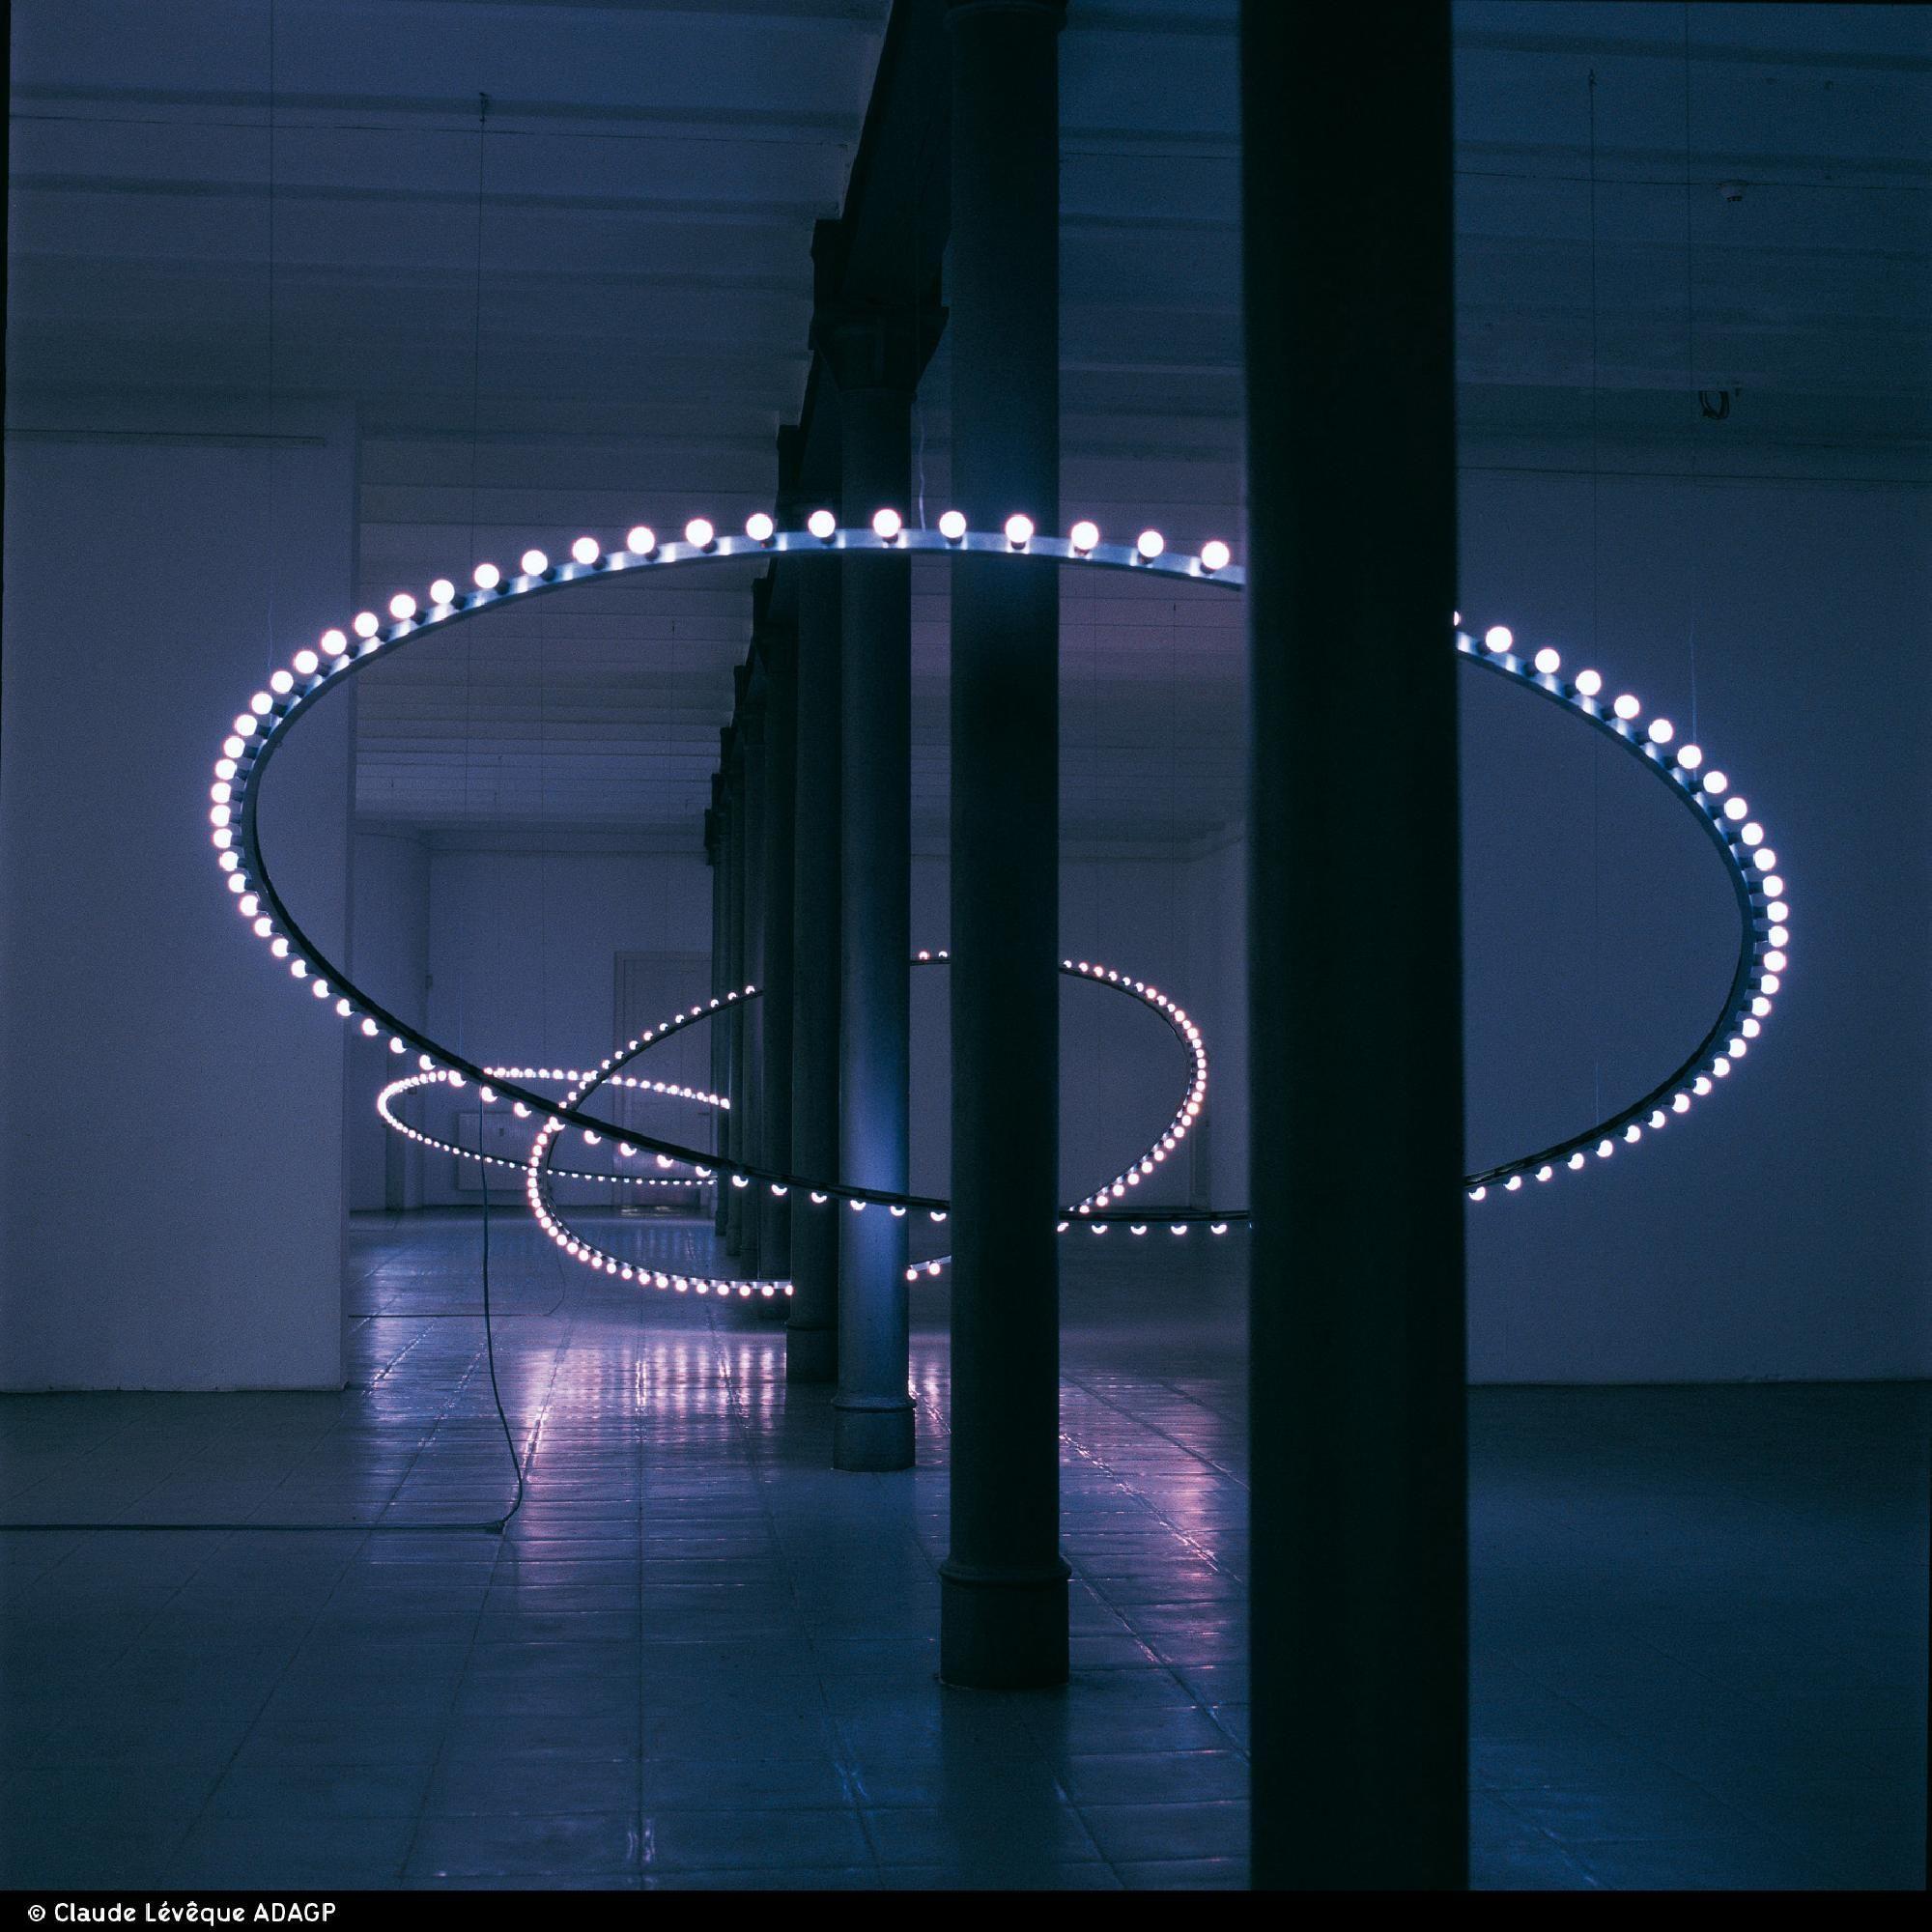 Whirlwind Installation In Situ Stadtische Galerie Breme Cercles De Lampes Bleues Avec Effet Chenillard Filtres Ble Light Art Installation Light Art Neon Art